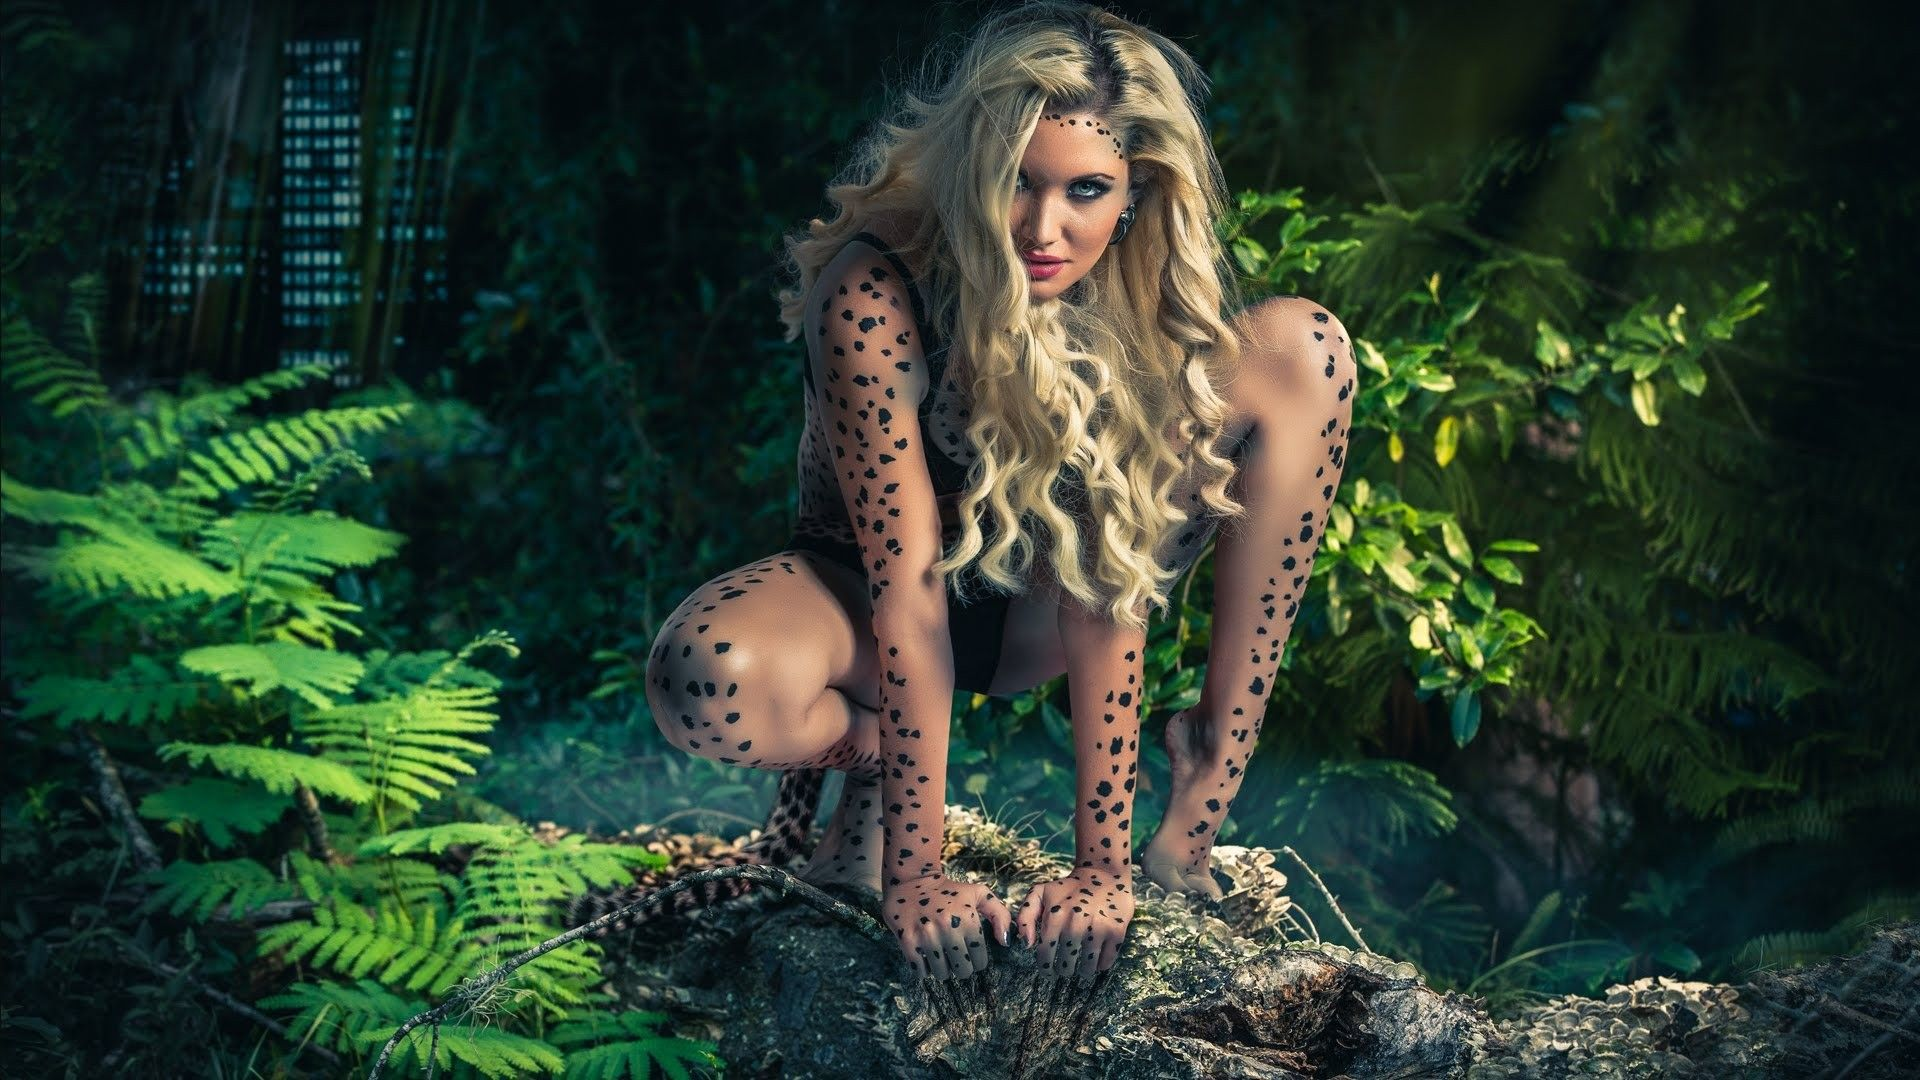 Furry cheetah girl